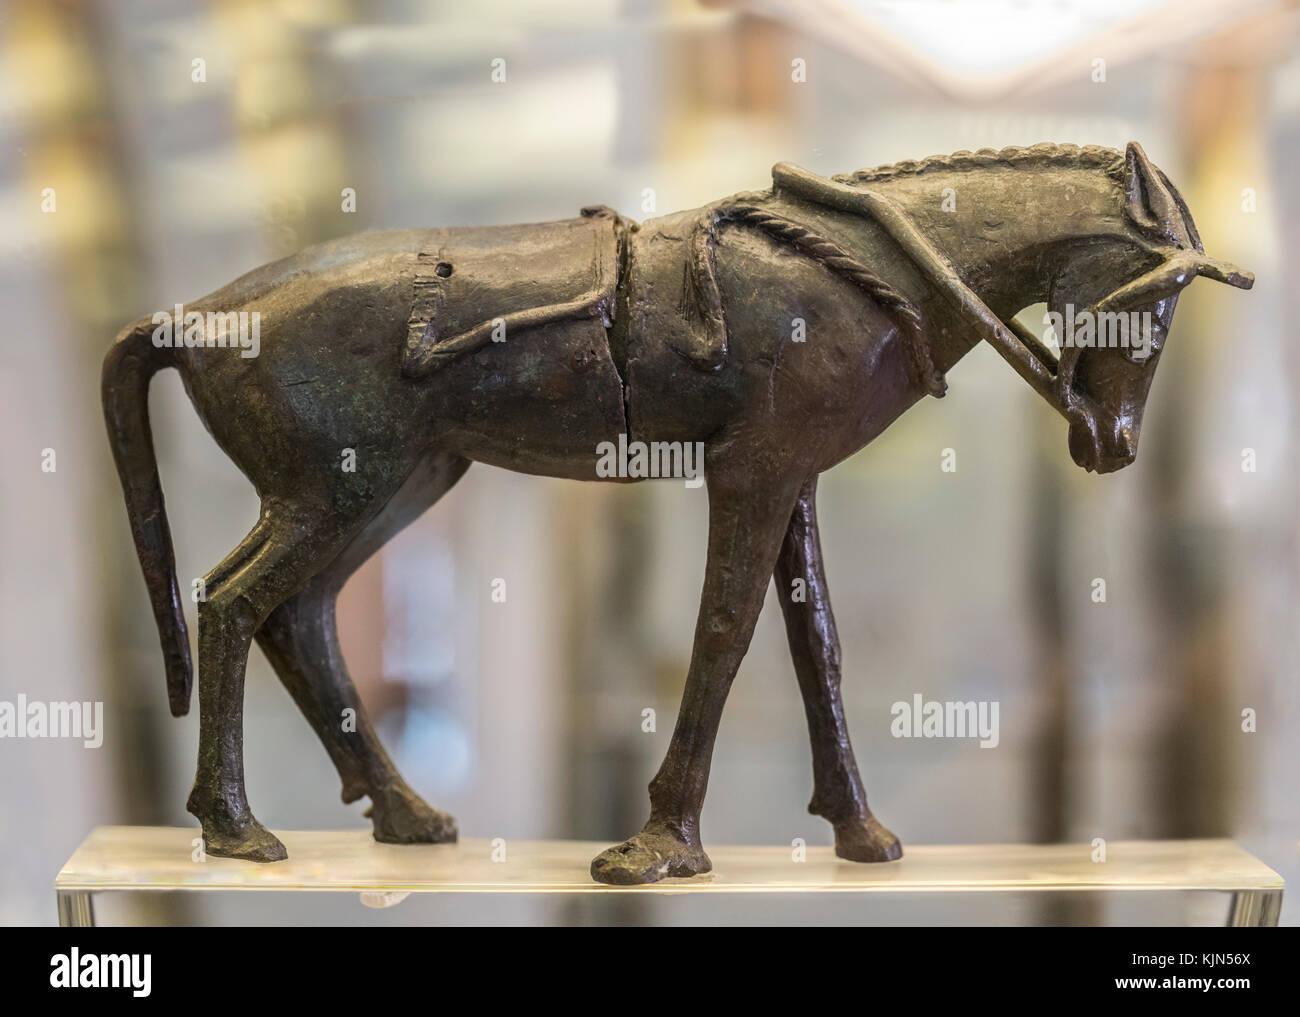 Badajoz, Spain - January 29, 2011: Horse figurine from Tartessian Sanctuary-Palace of Cancho Roano, Zalamea de la - Stock Image